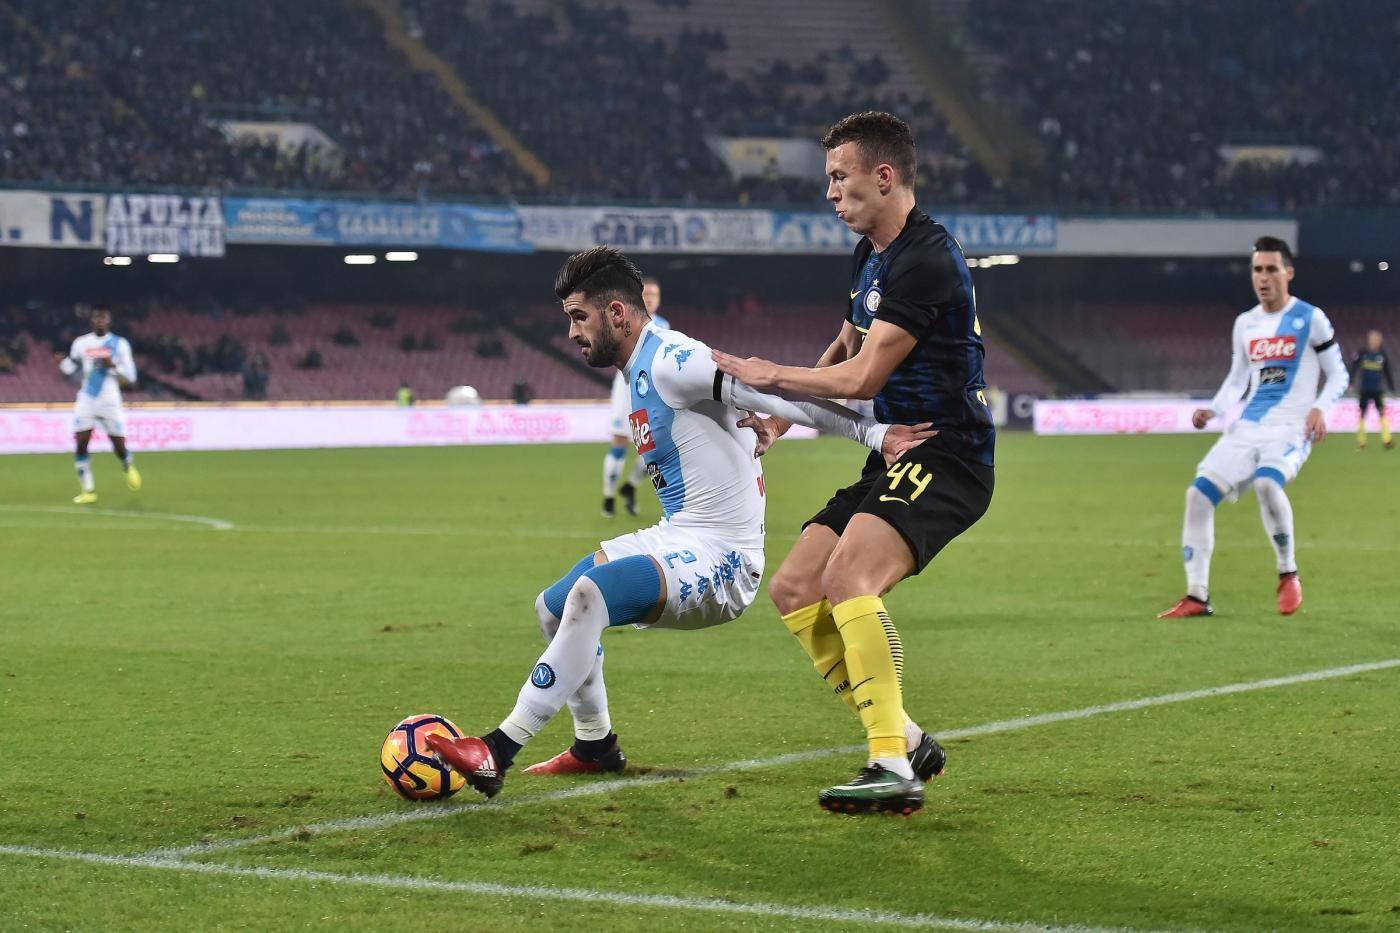 Napoli vs Inter Serie A Tim 2016/2017